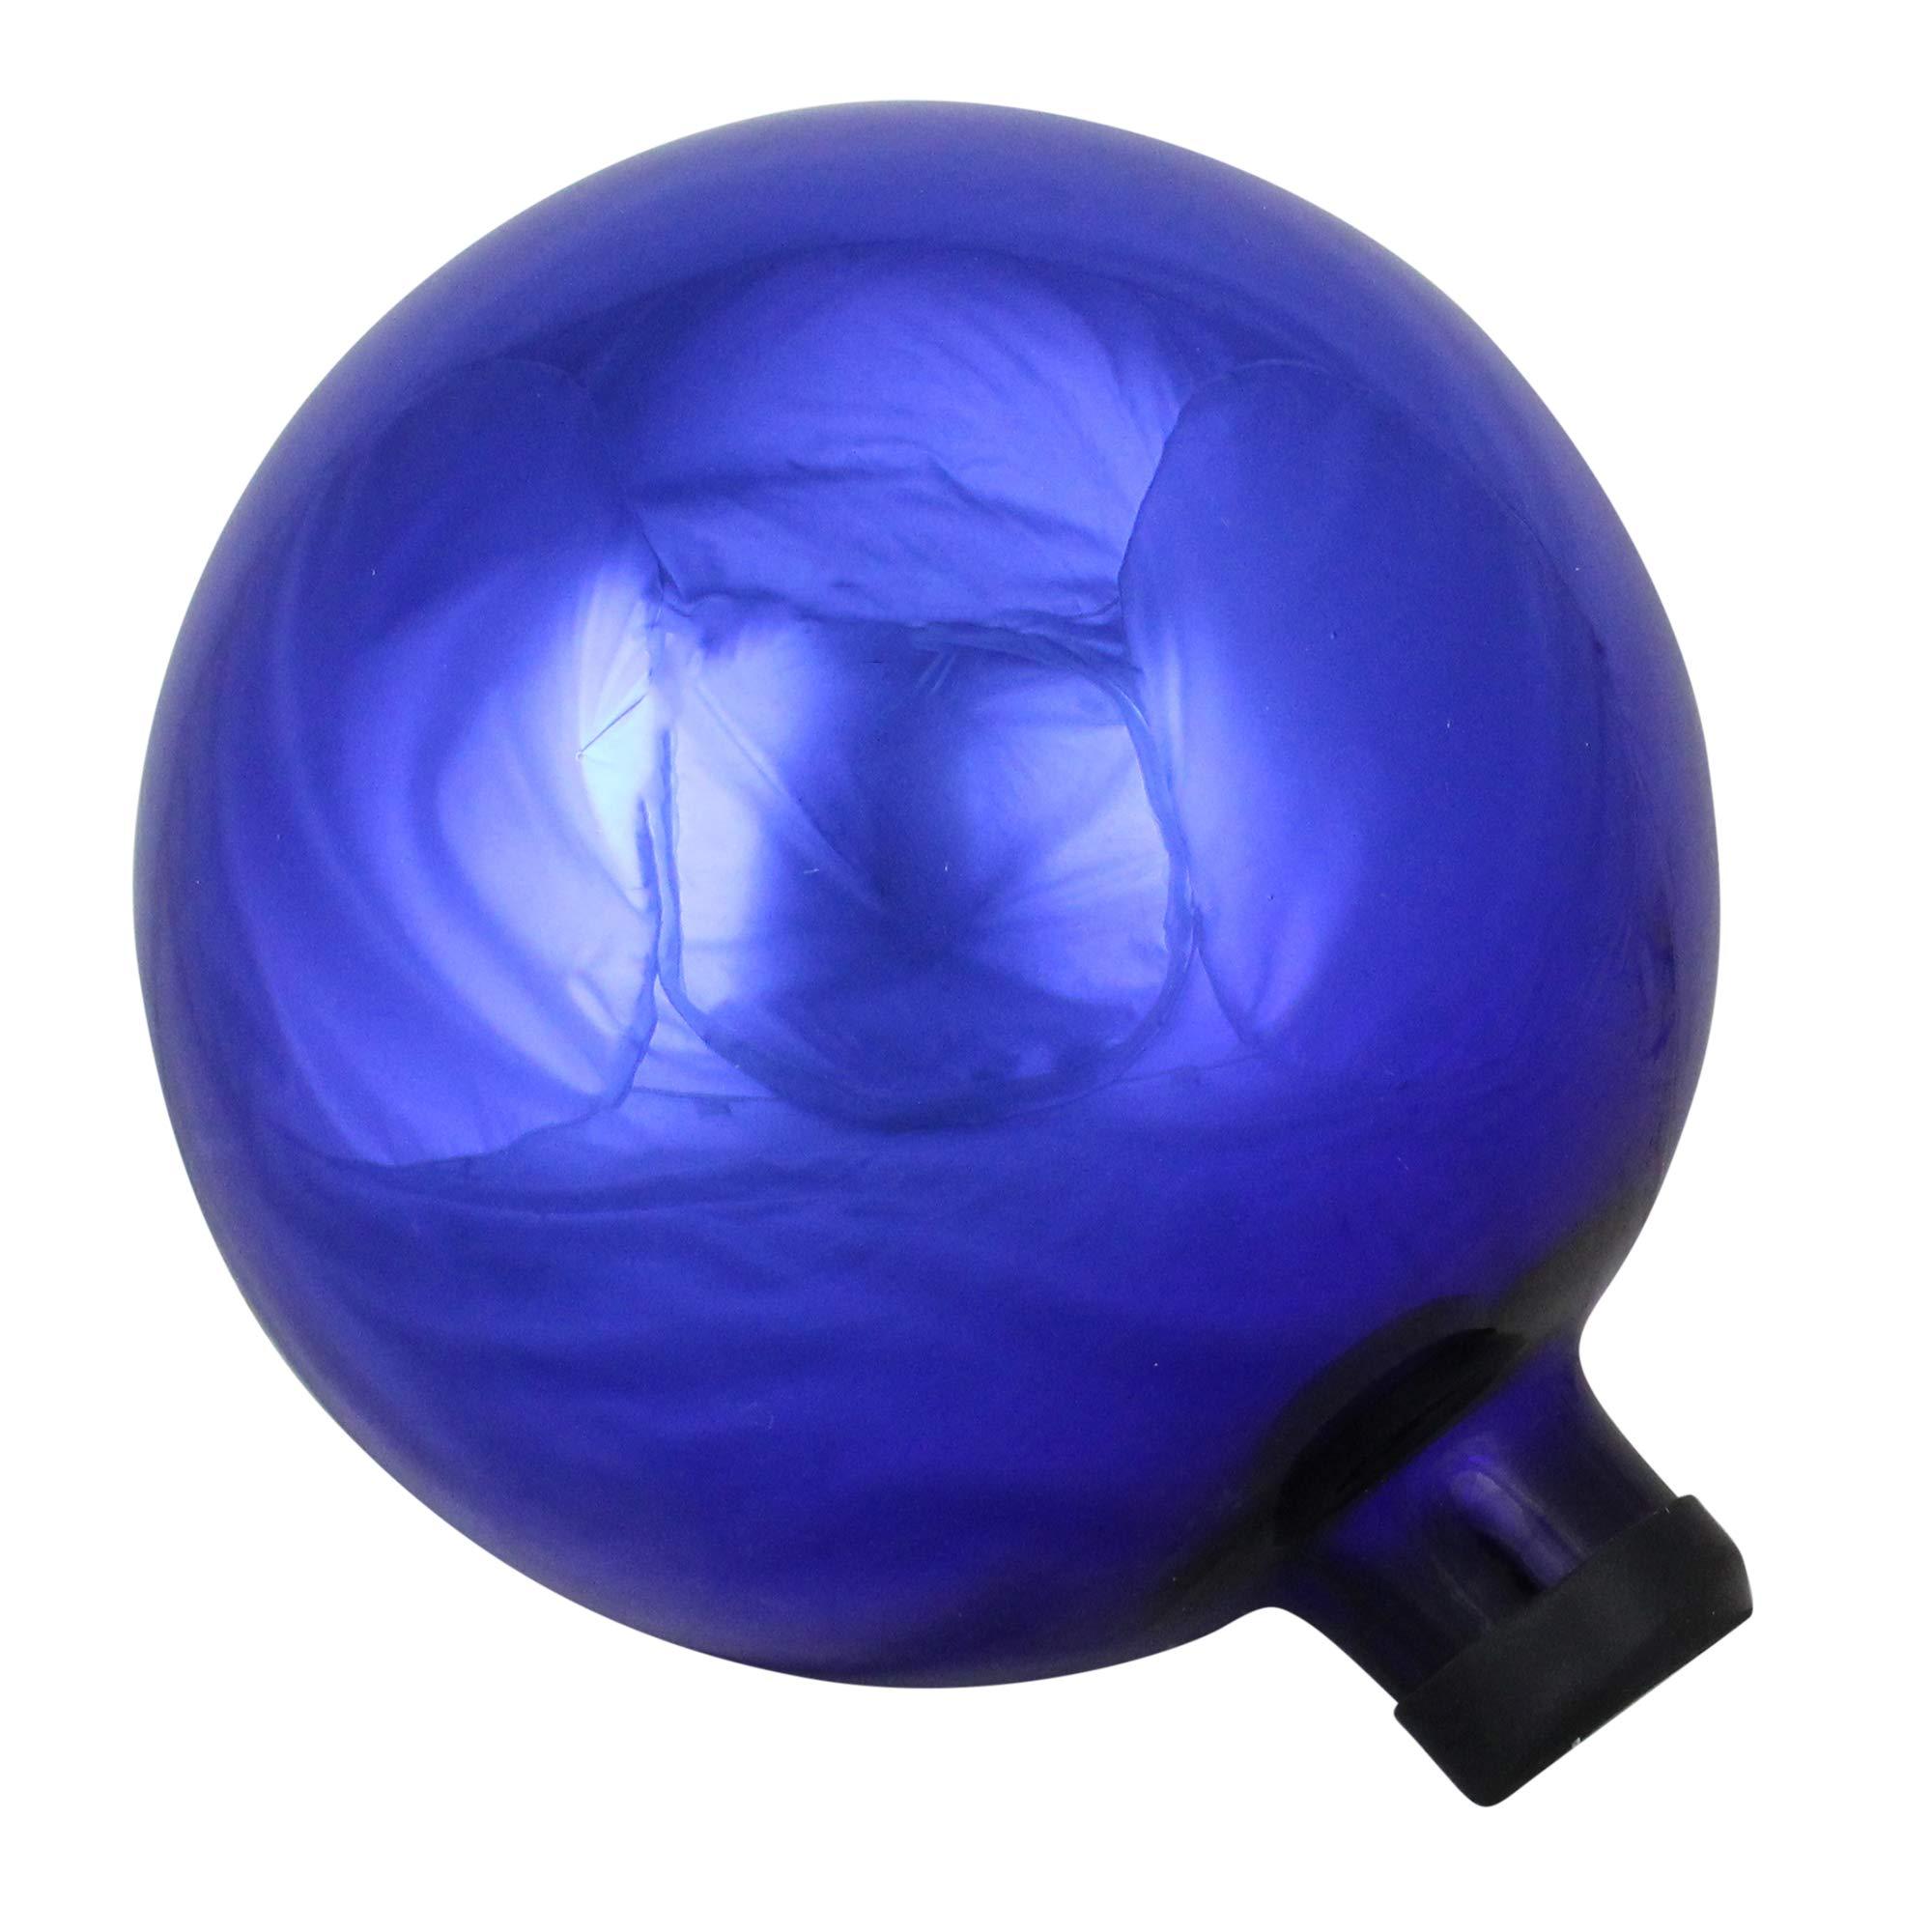 Northlight 10'' Shiny Royal Blue Glass Outdoor Patio Garden Gazing Ball